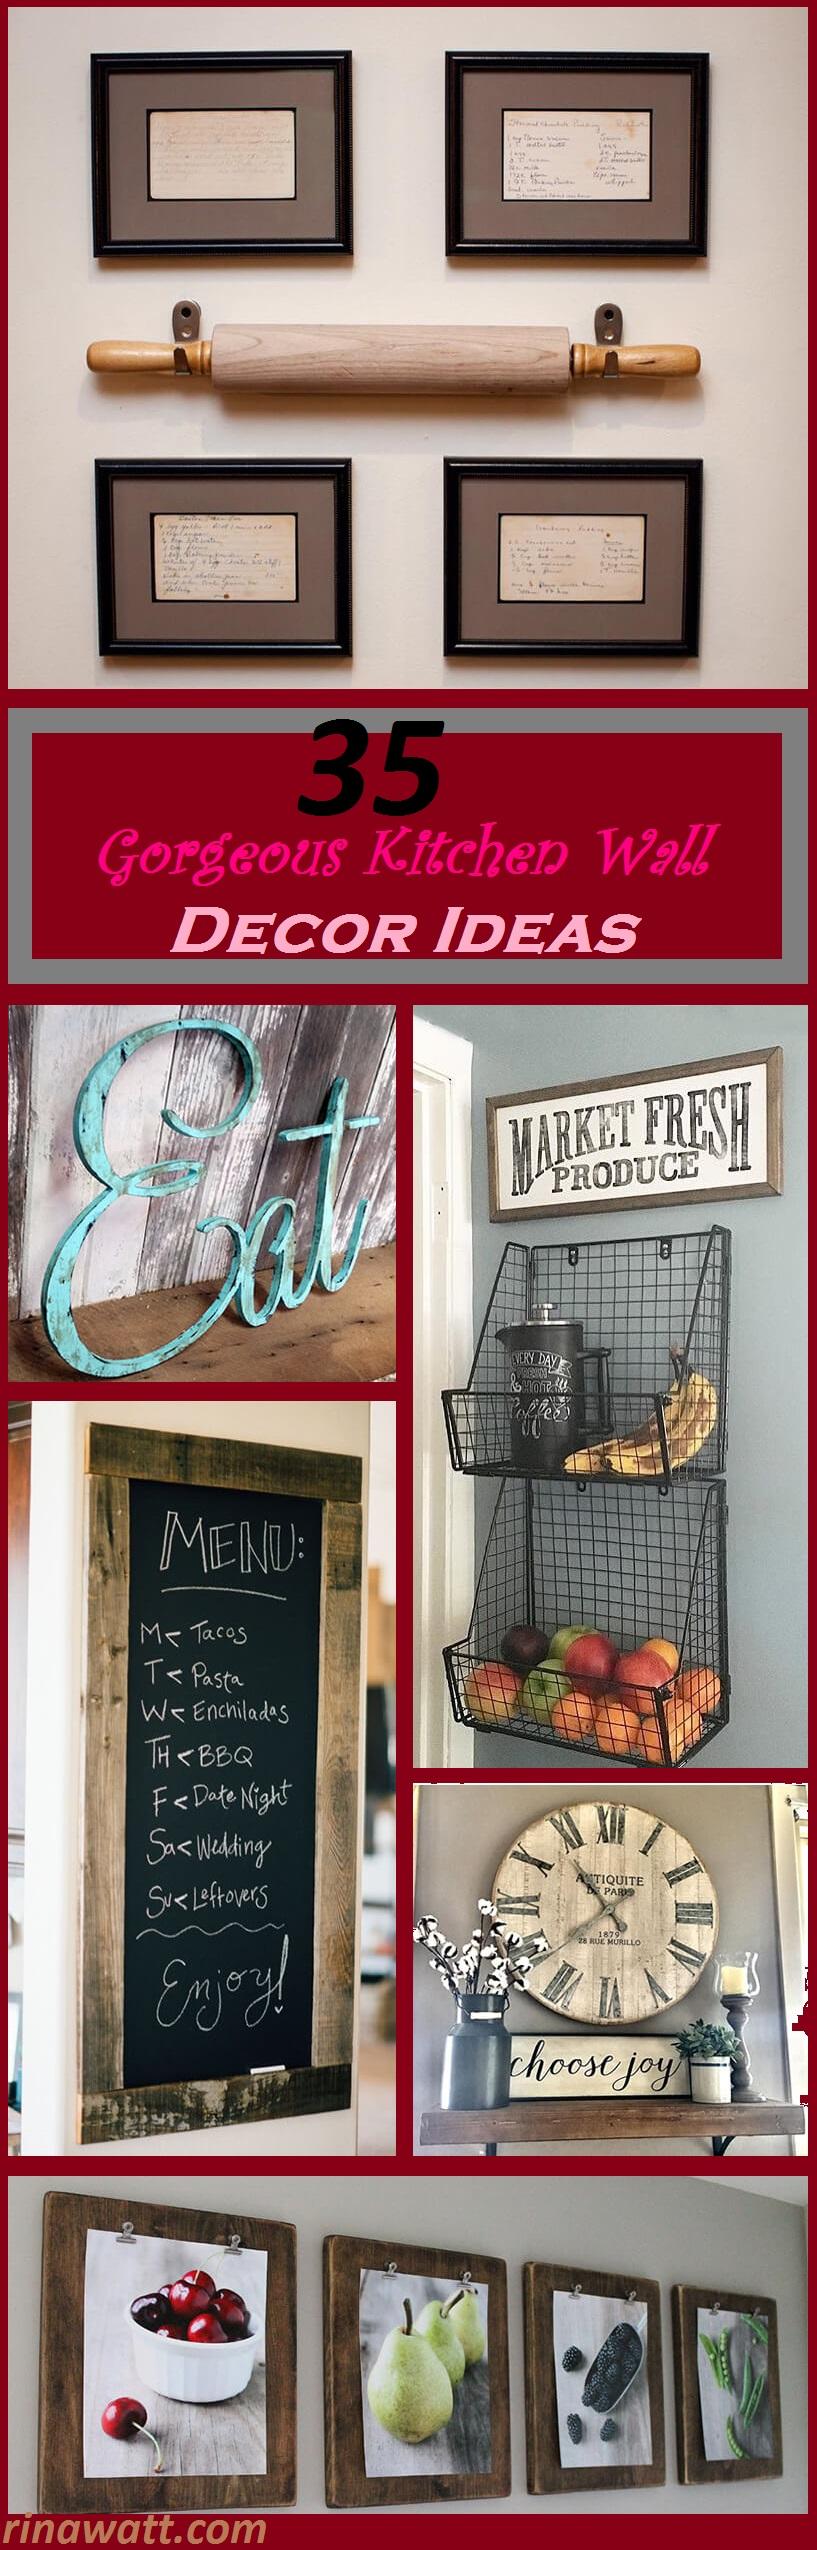 35 Pretty Kitchen Wall Decor Ideas To Stir Up Your Blank Walls Rina Watt Blogger Home Decor Diy And Recipes